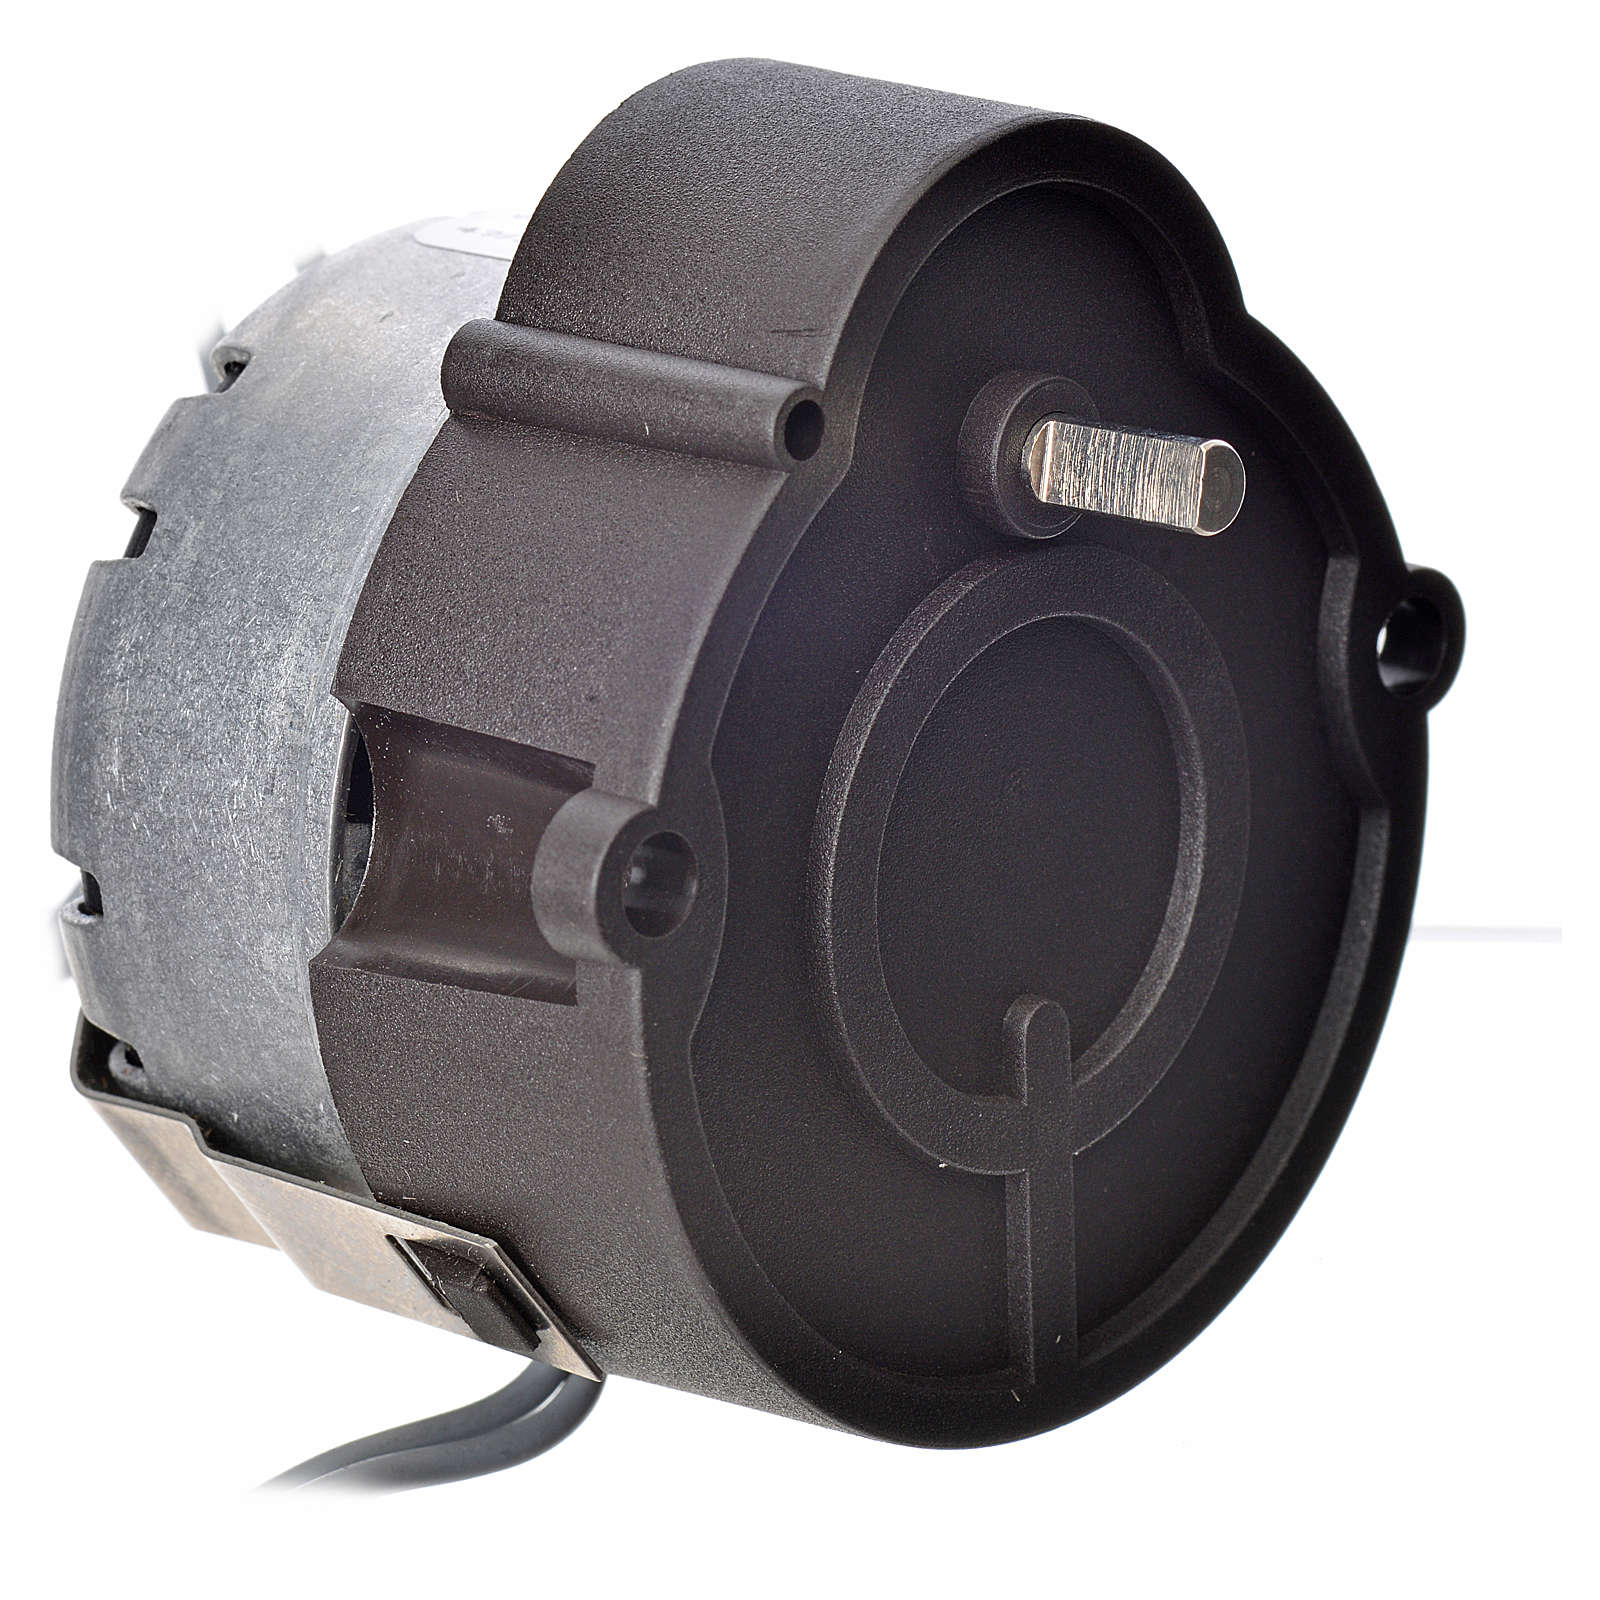 Nativity accessory, MR gear motor, 1-3 t/m 4